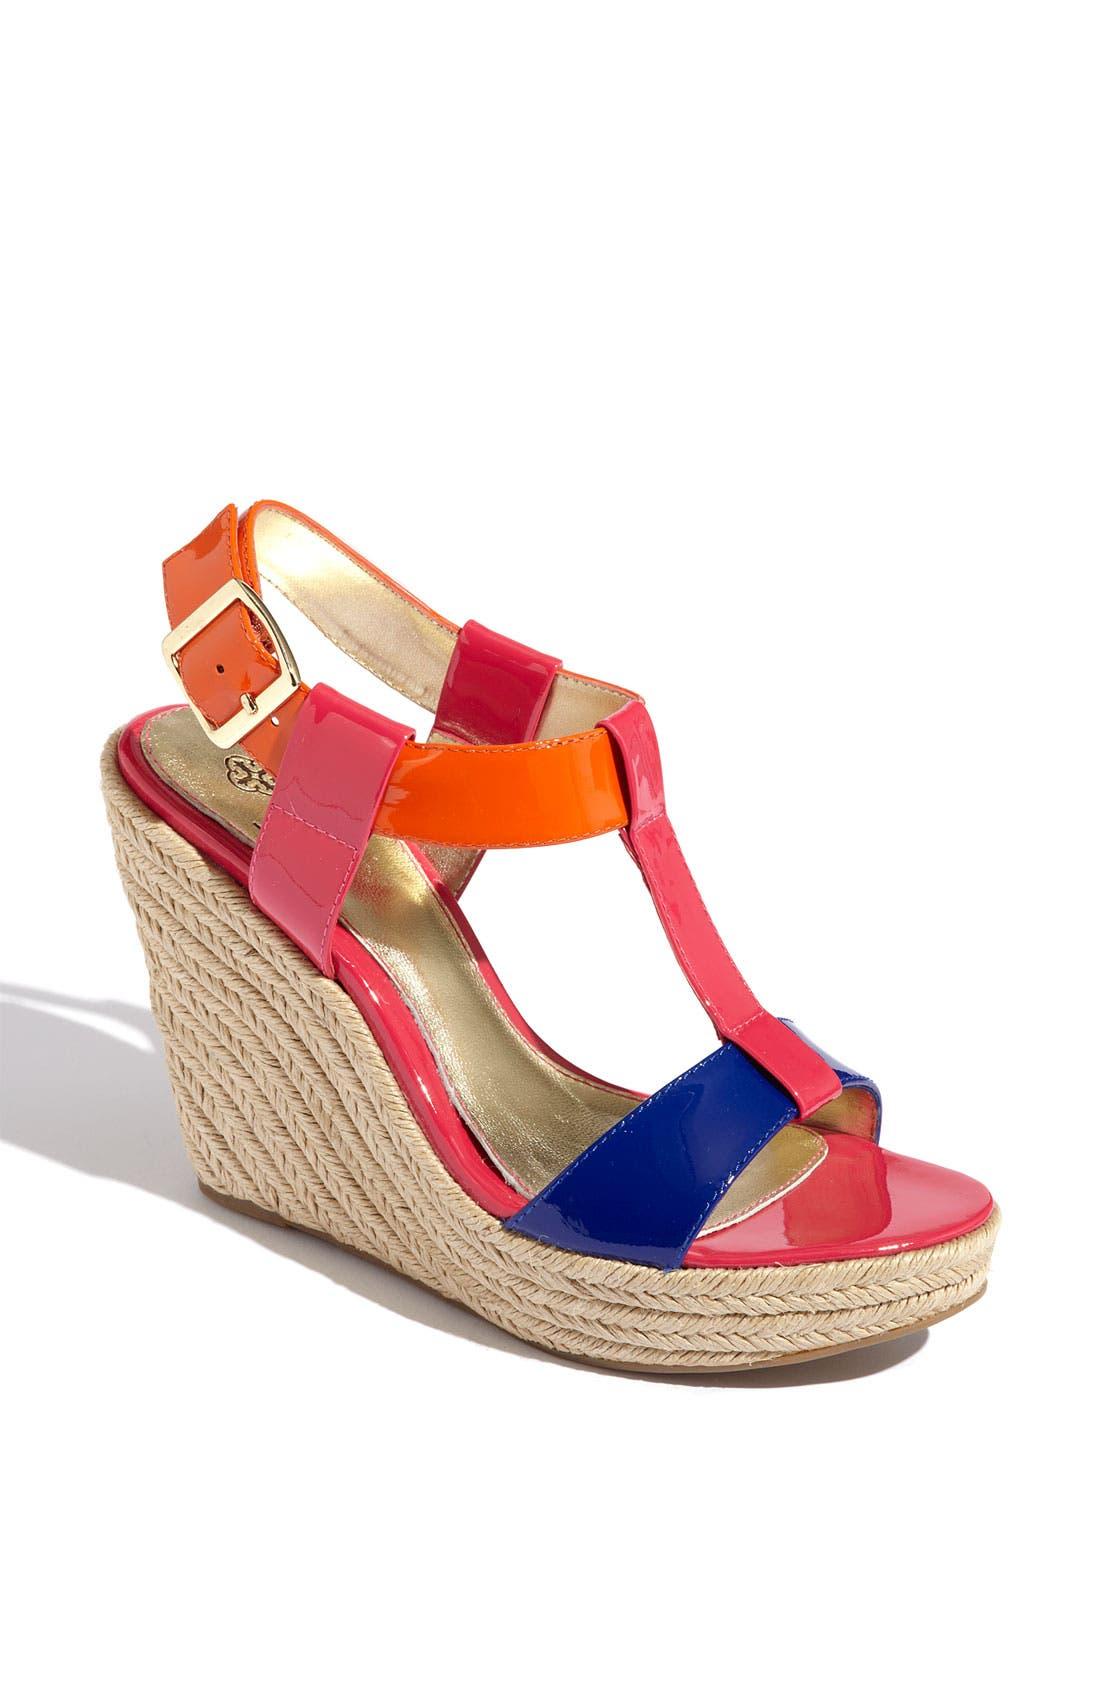 Alternate Image 1 Selected - Isolá 'Olencia' Wedge Sandal